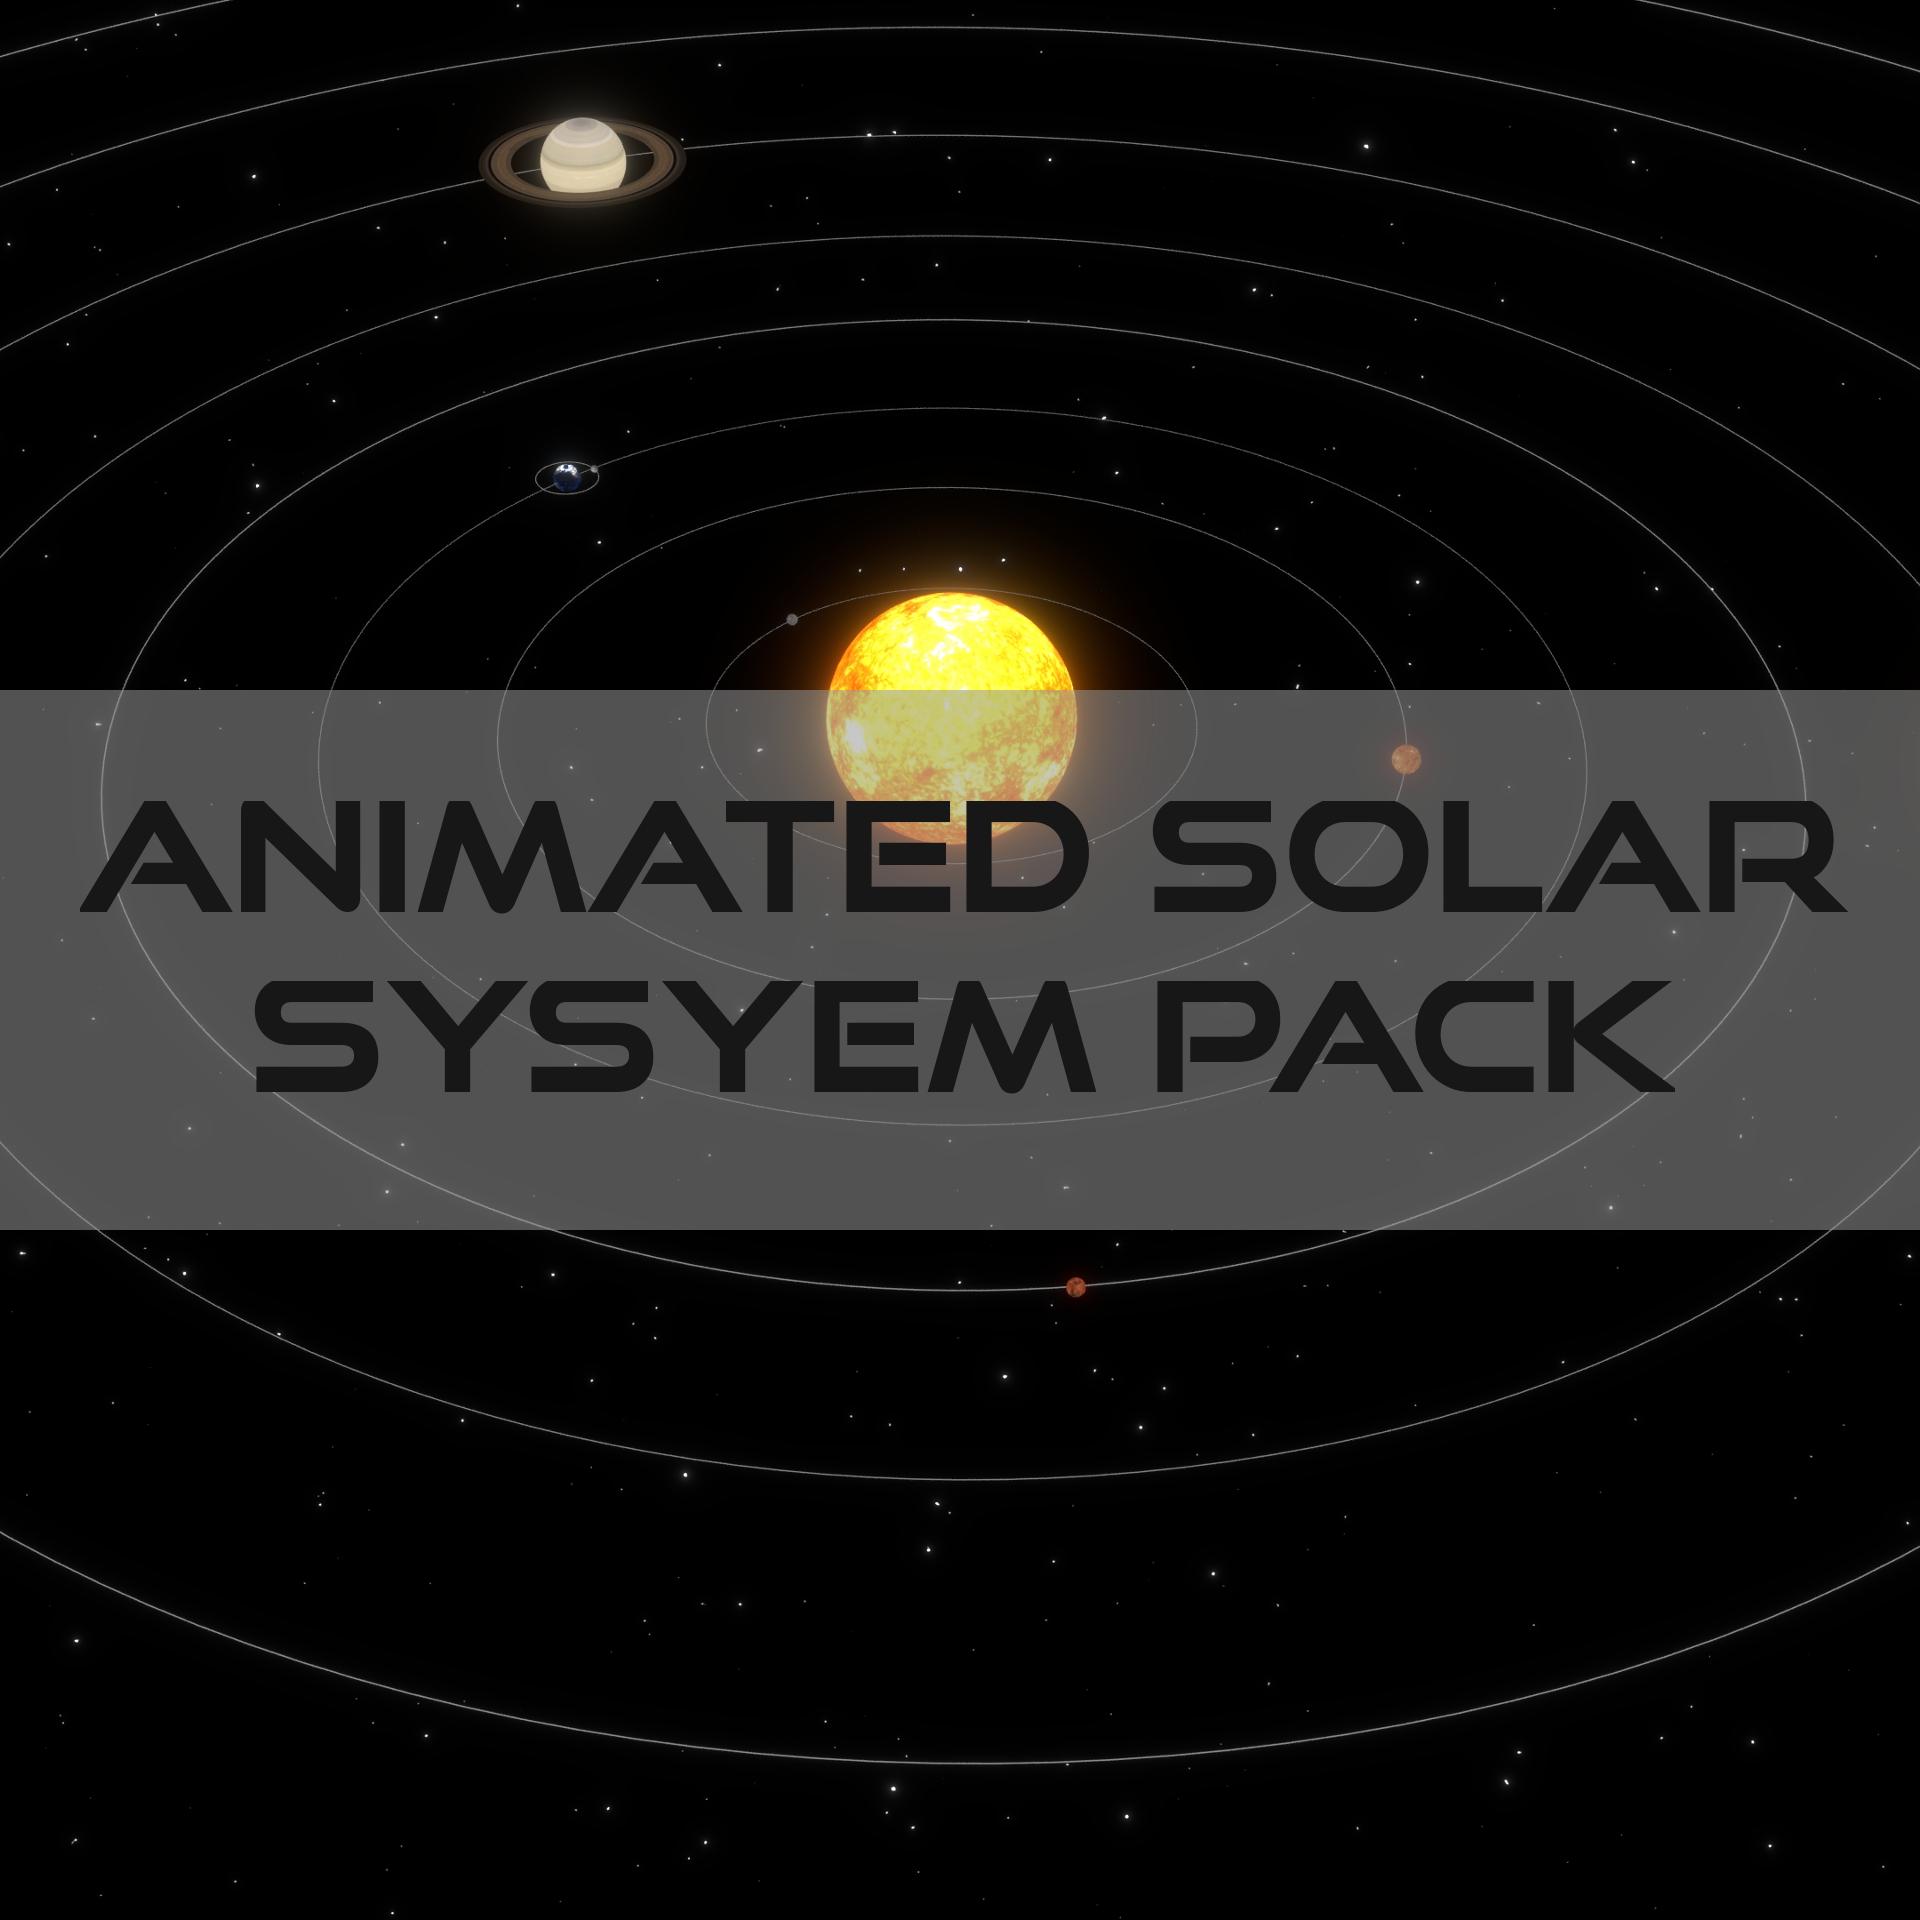 solar system animated - photo #30